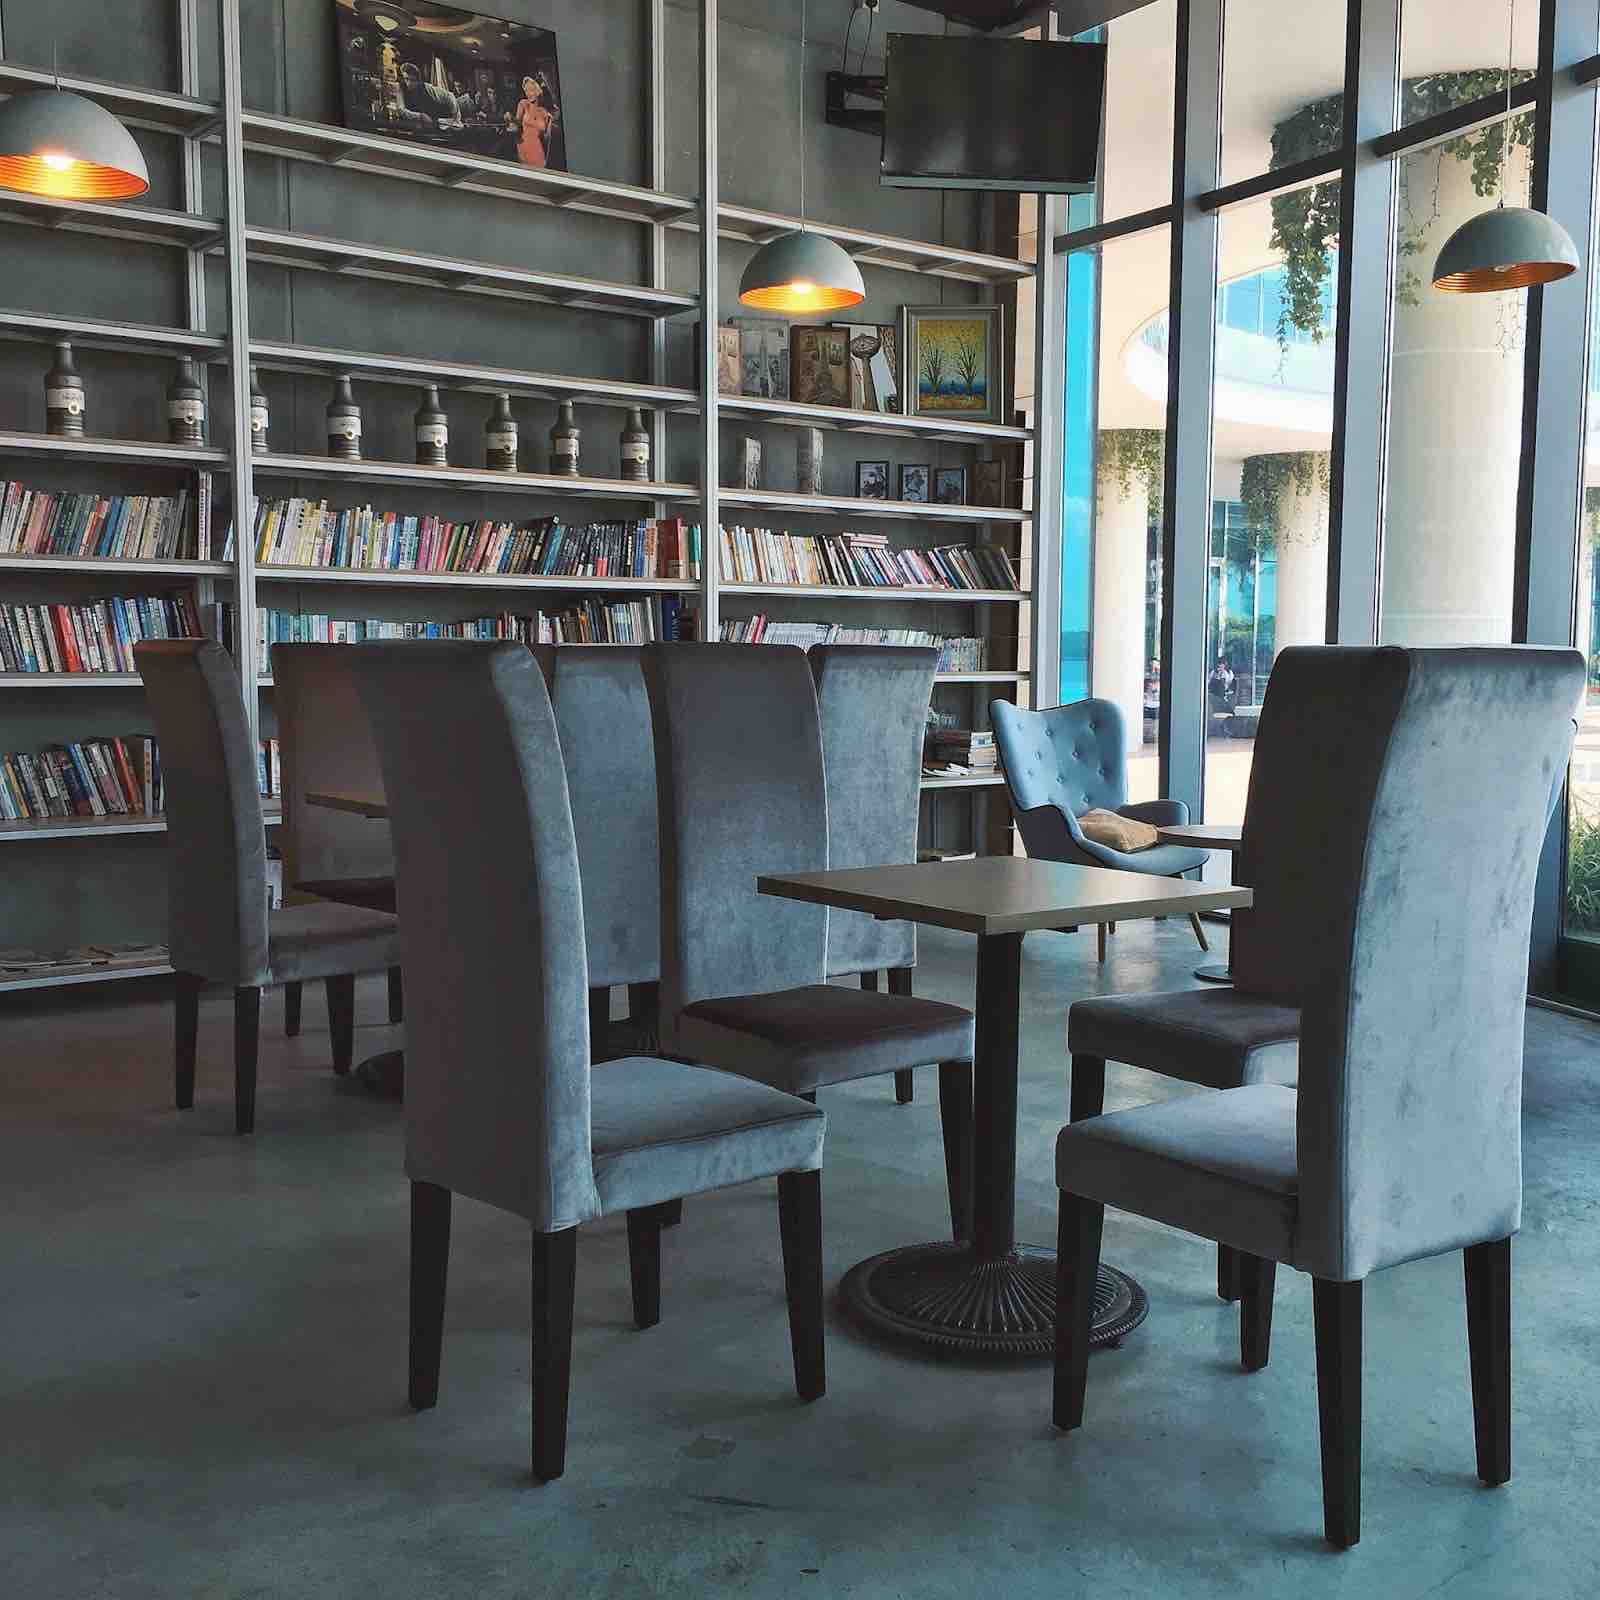 Insomnia Café Johor Bahru - AspirantSG